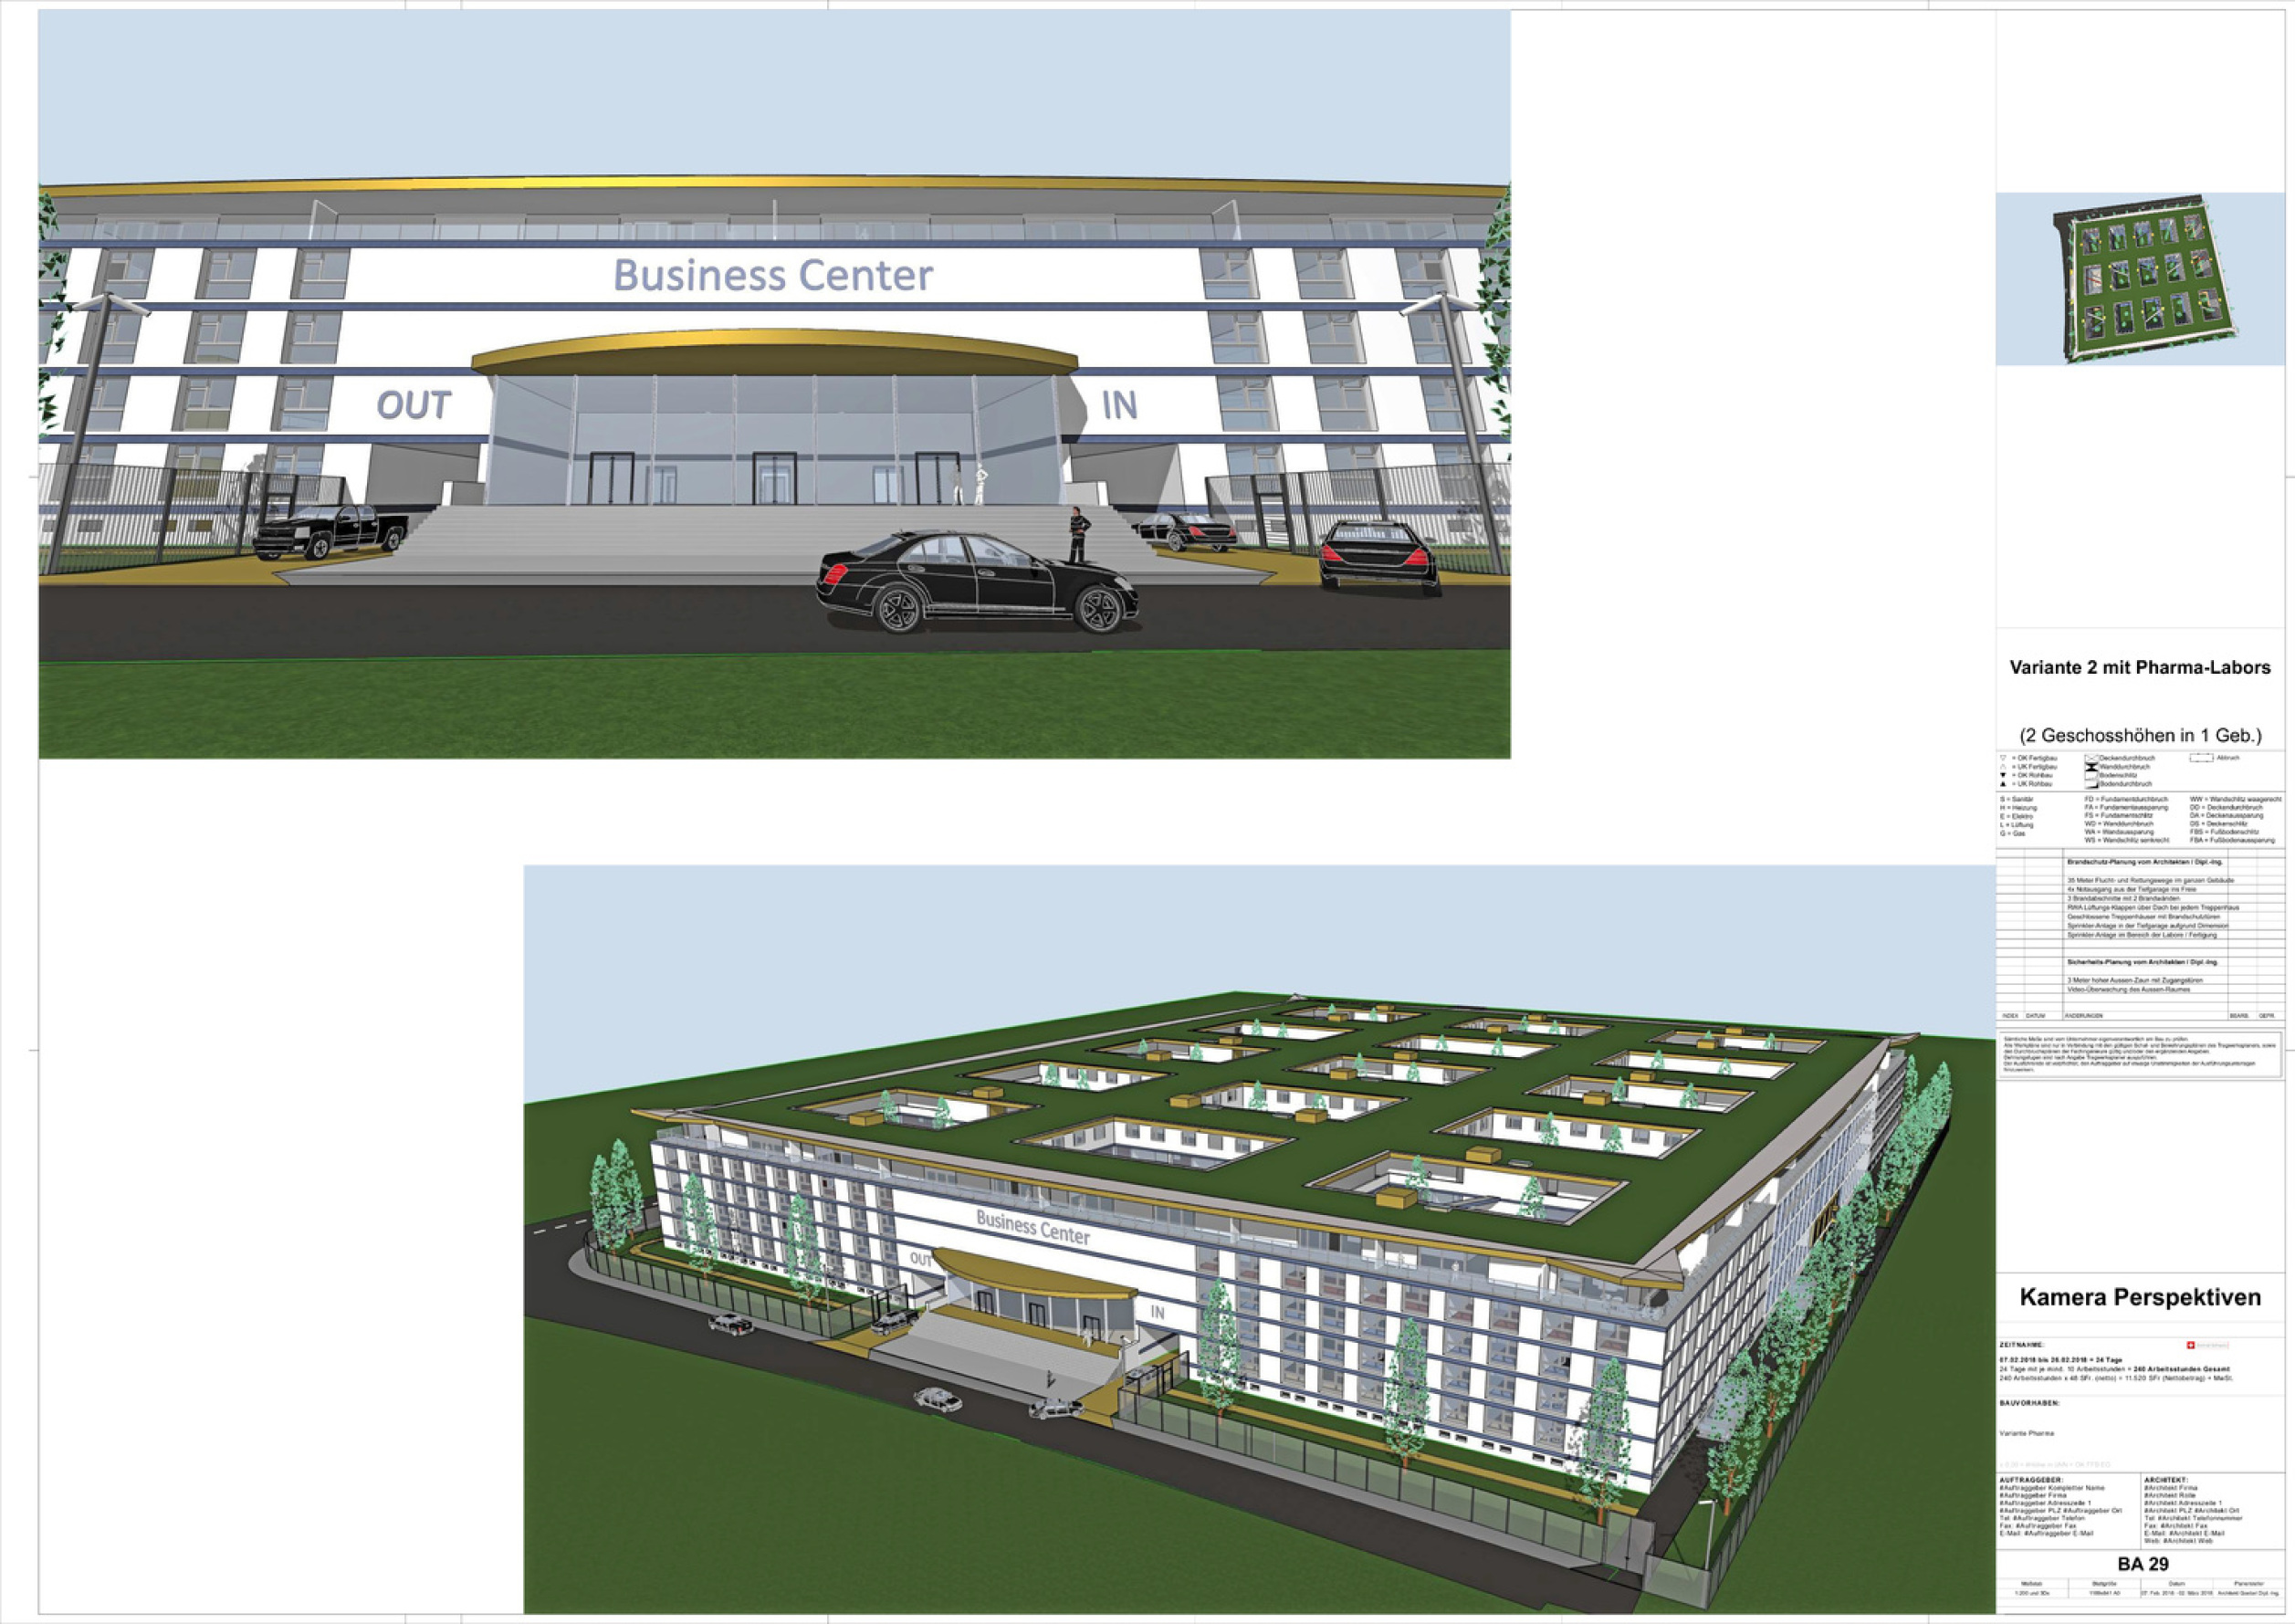 Kameras_Eingang_Alles_Pharma-Business-Center-Architekt-Volker-Goebel-Dipl.-Ing-Wilen-bei-Wollerau-28